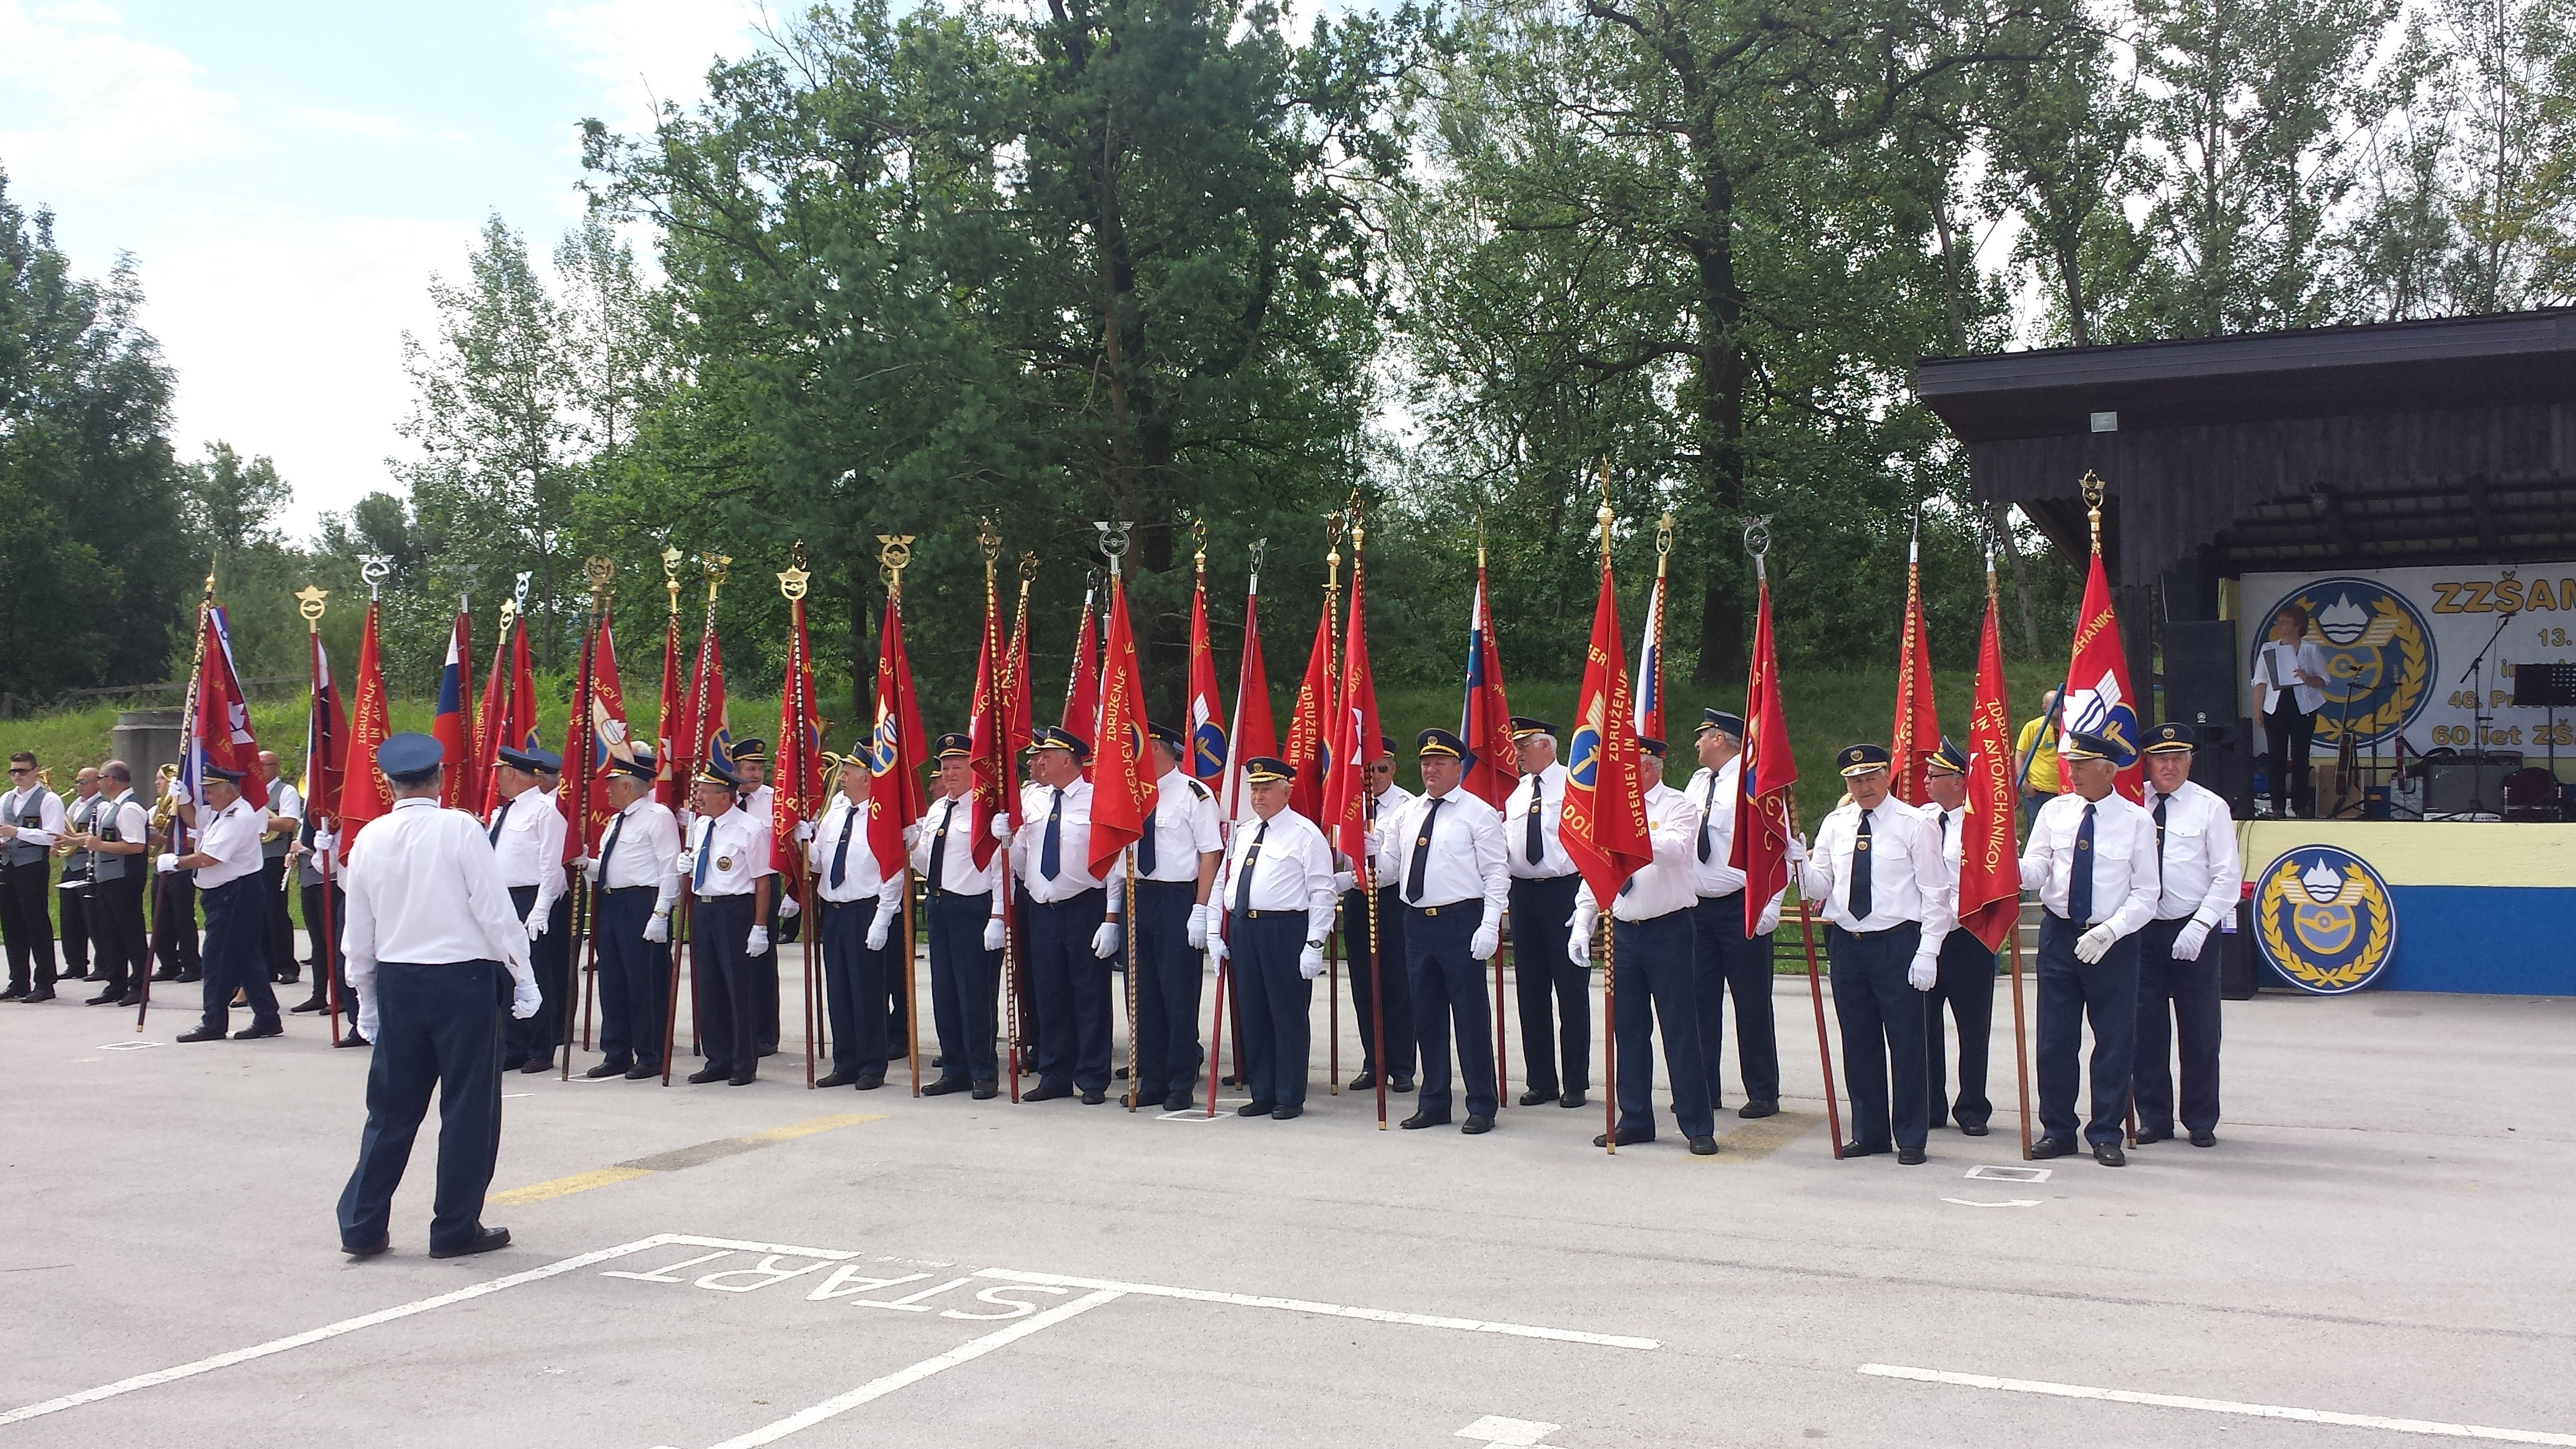 Slowenien 2014 ZSAM Savinjska dolona 60 Jährige Vereinsjubiläum